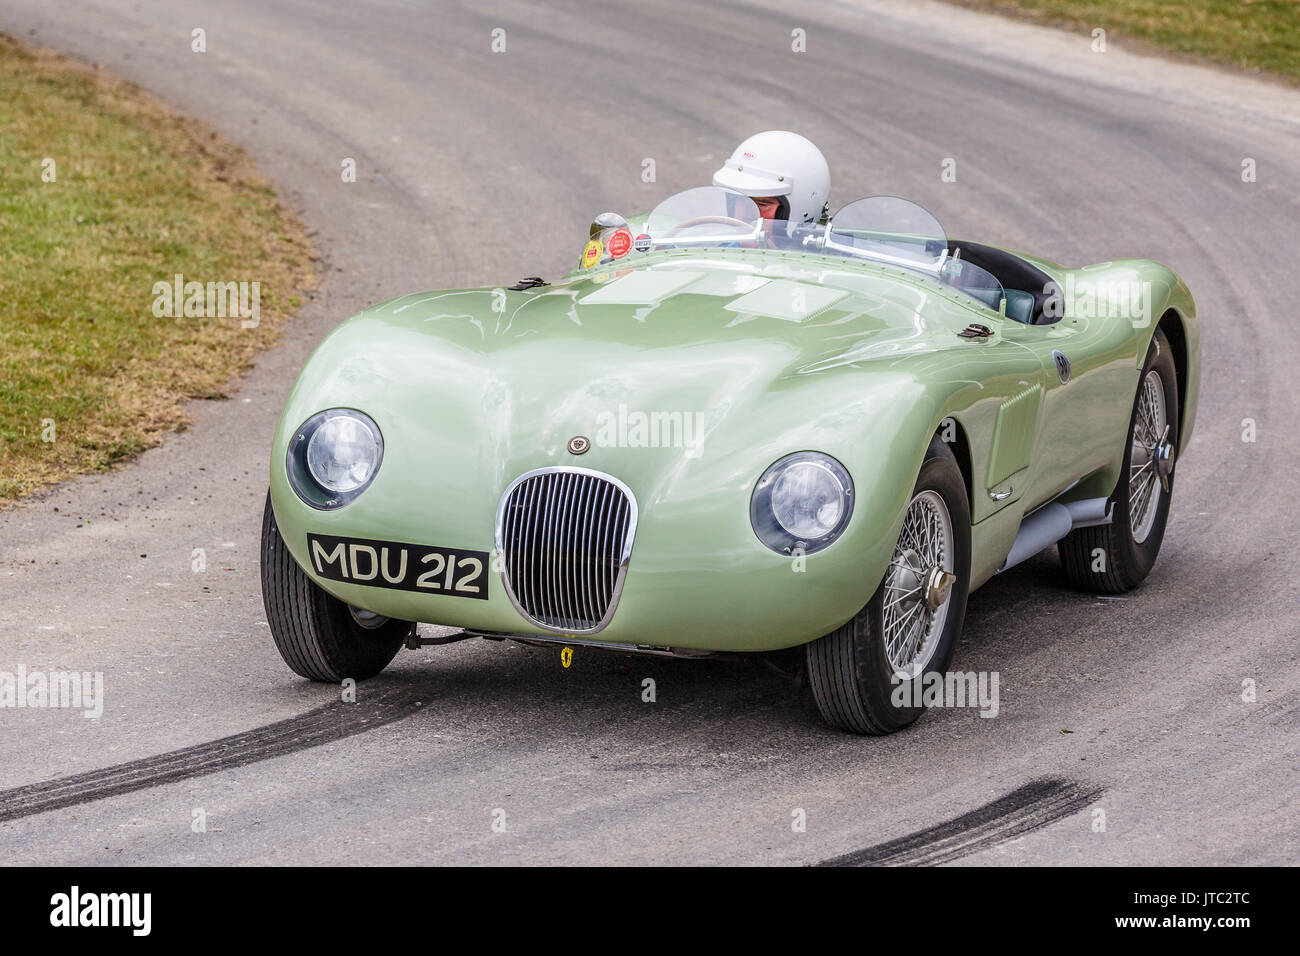 1953 jaguar c type le mans endurance racer with driver andrew frankel stock photo royalty free. Black Bedroom Furniture Sets. Home Design Ideas